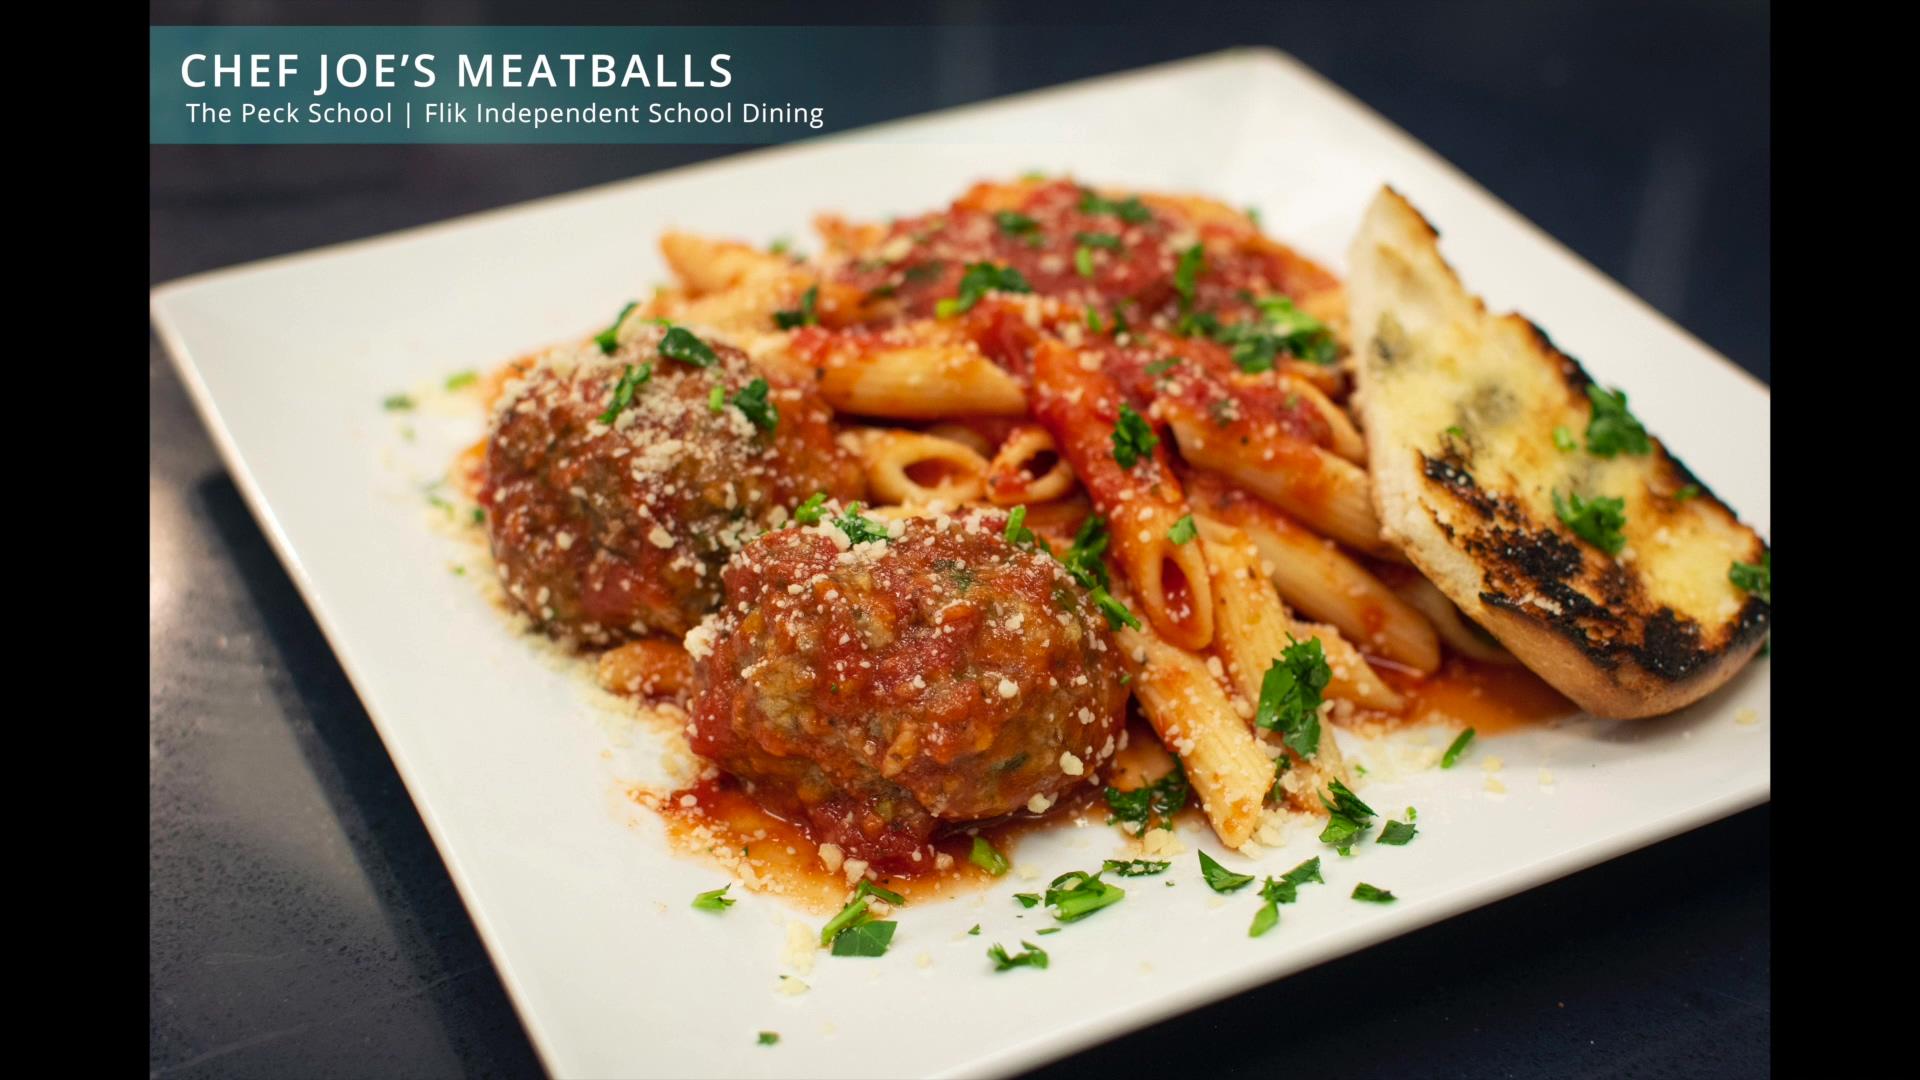 Chef Joes Meatballs and Marinara